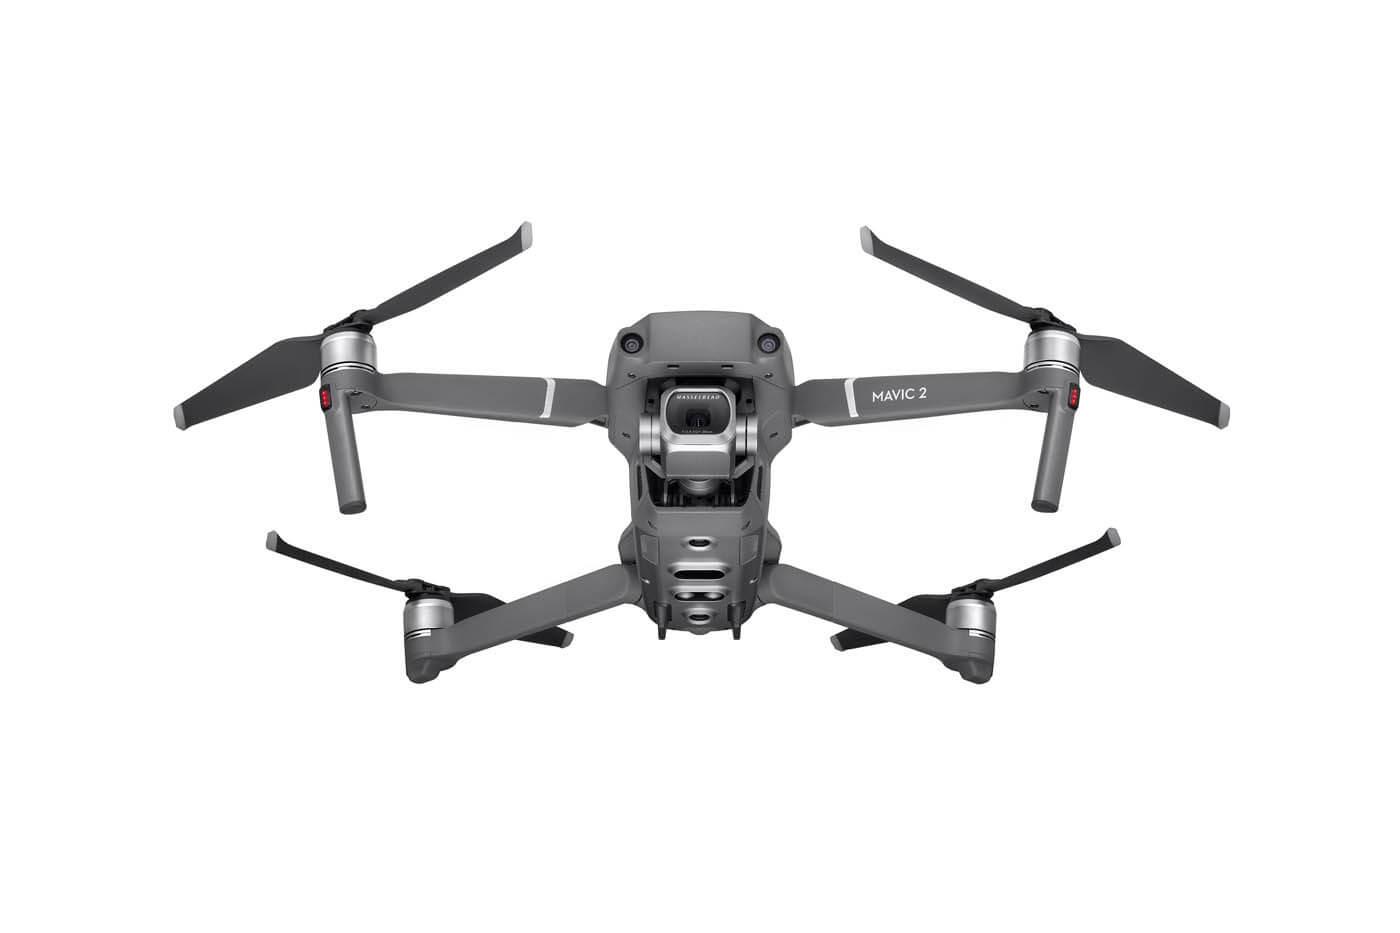 Mavic 2 Pro kompaktiskas dronas